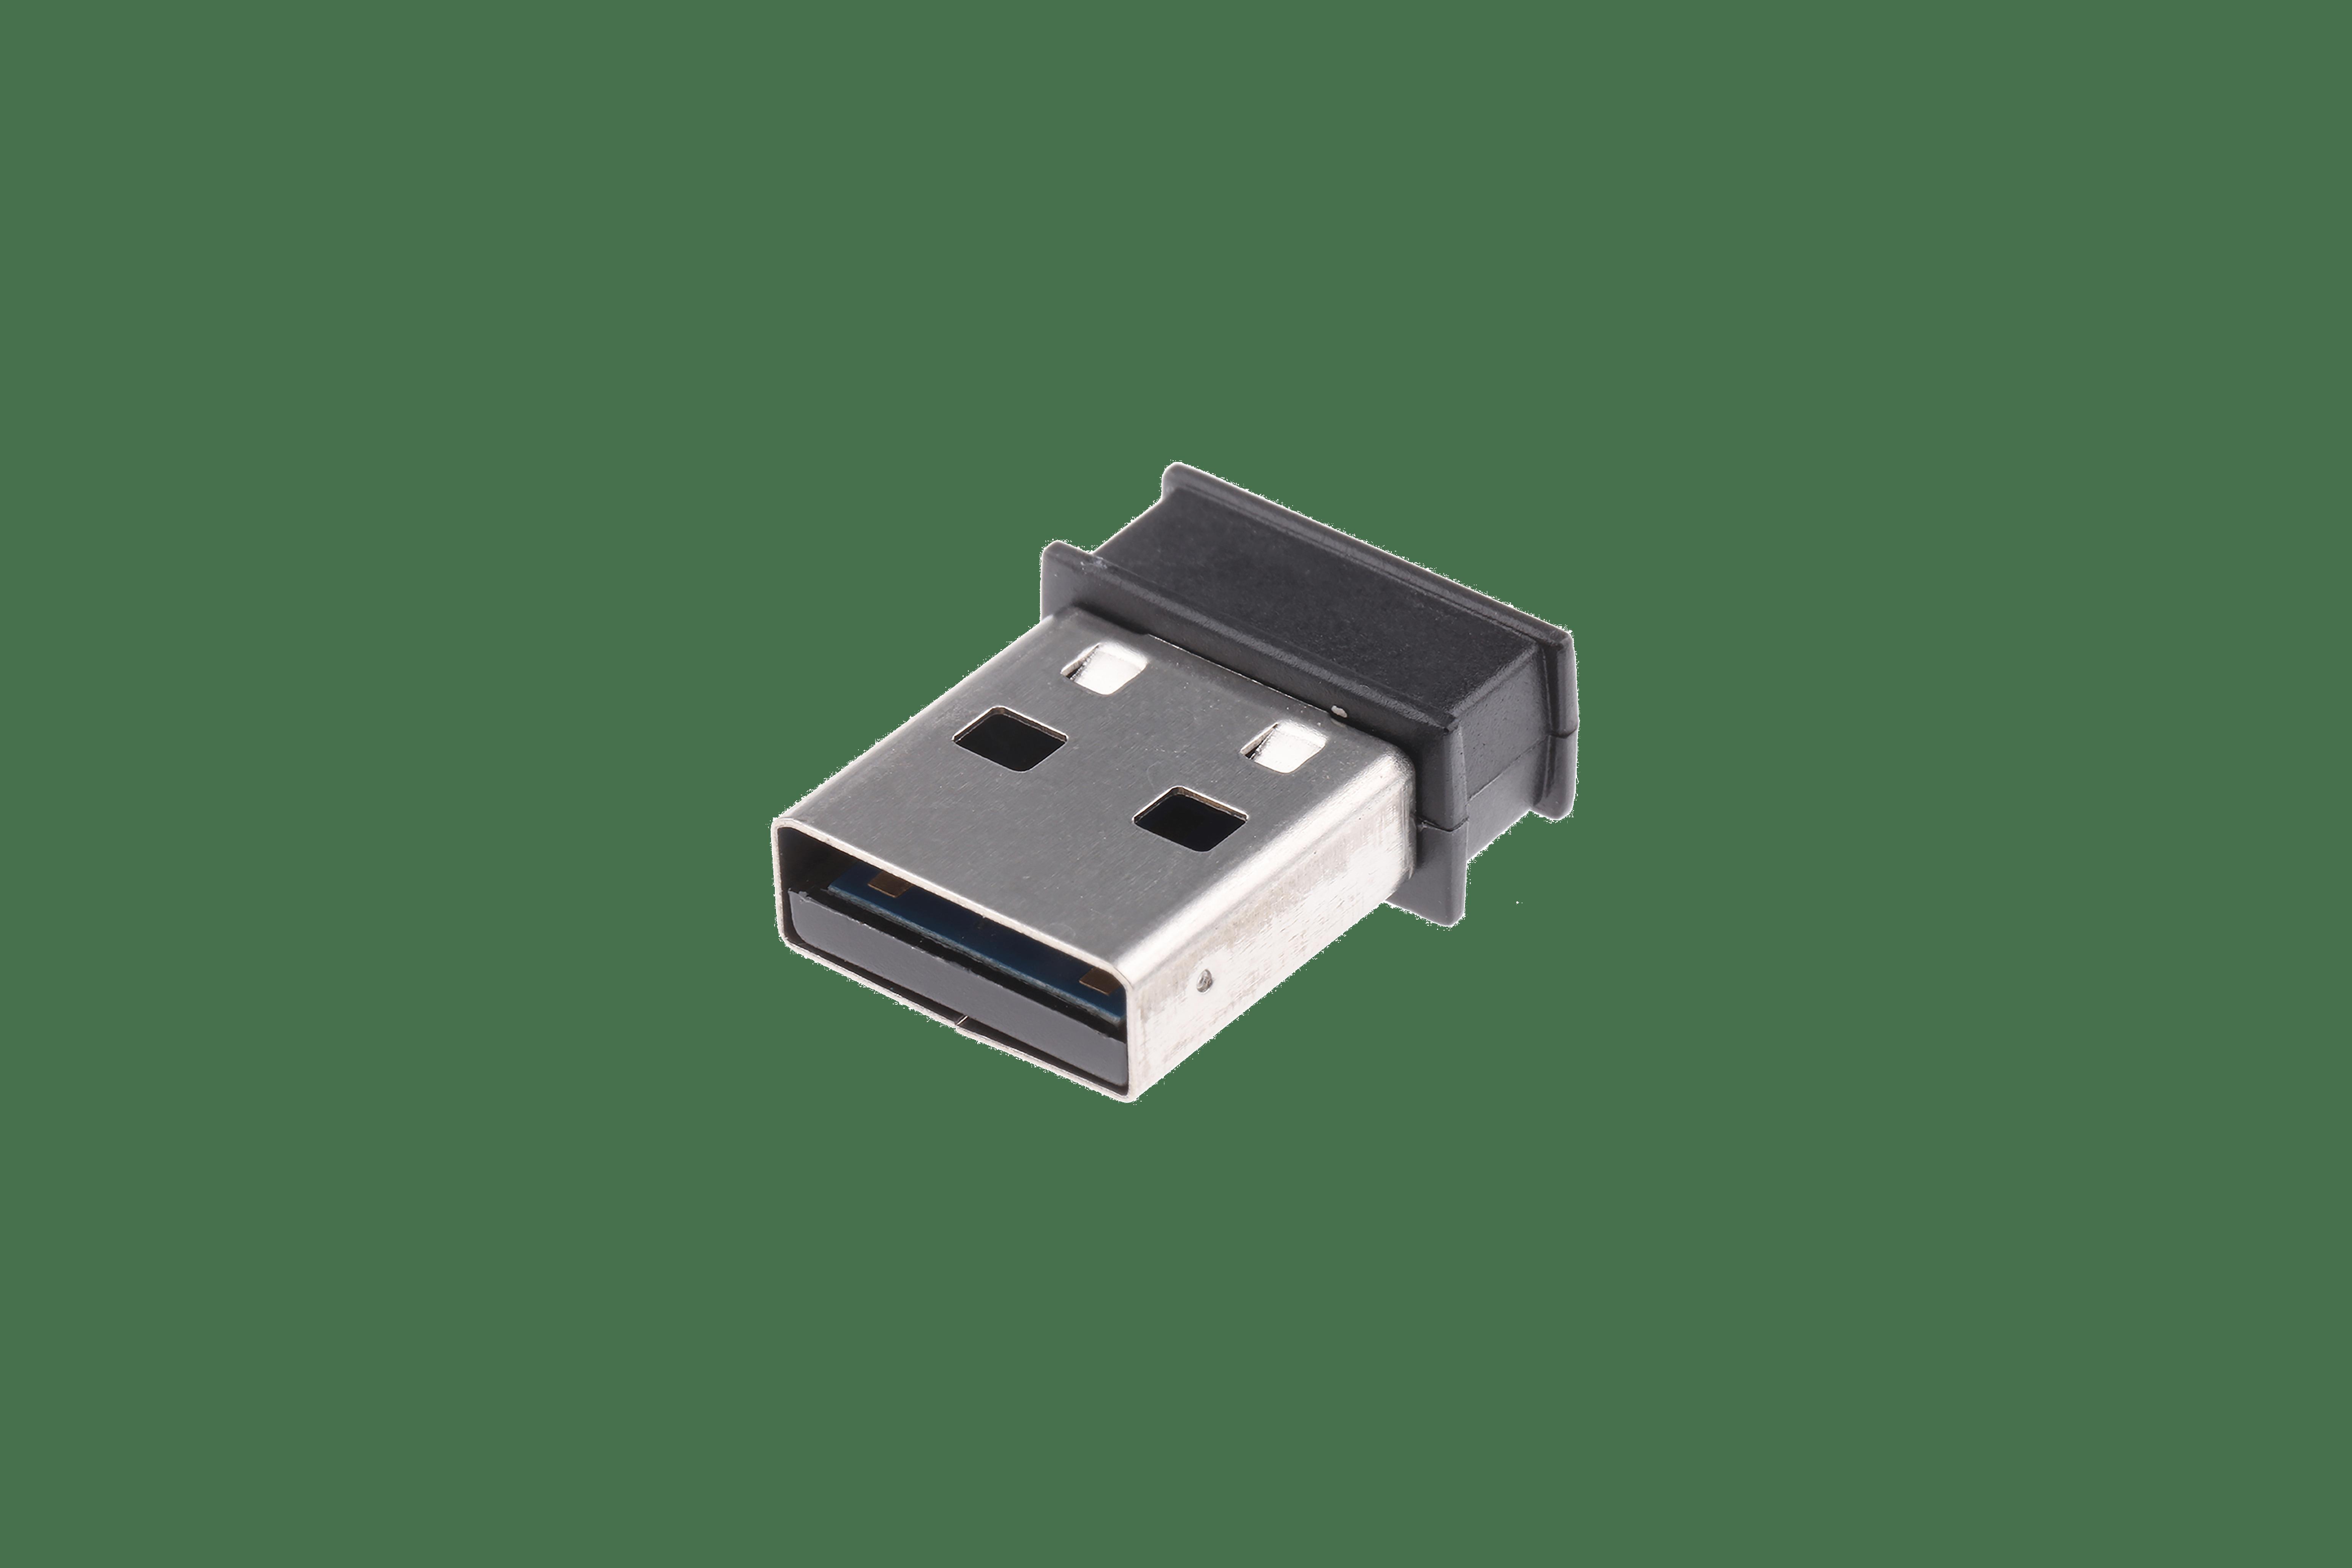 Bluetooth v4 Niedrigenergie USB-Dongle